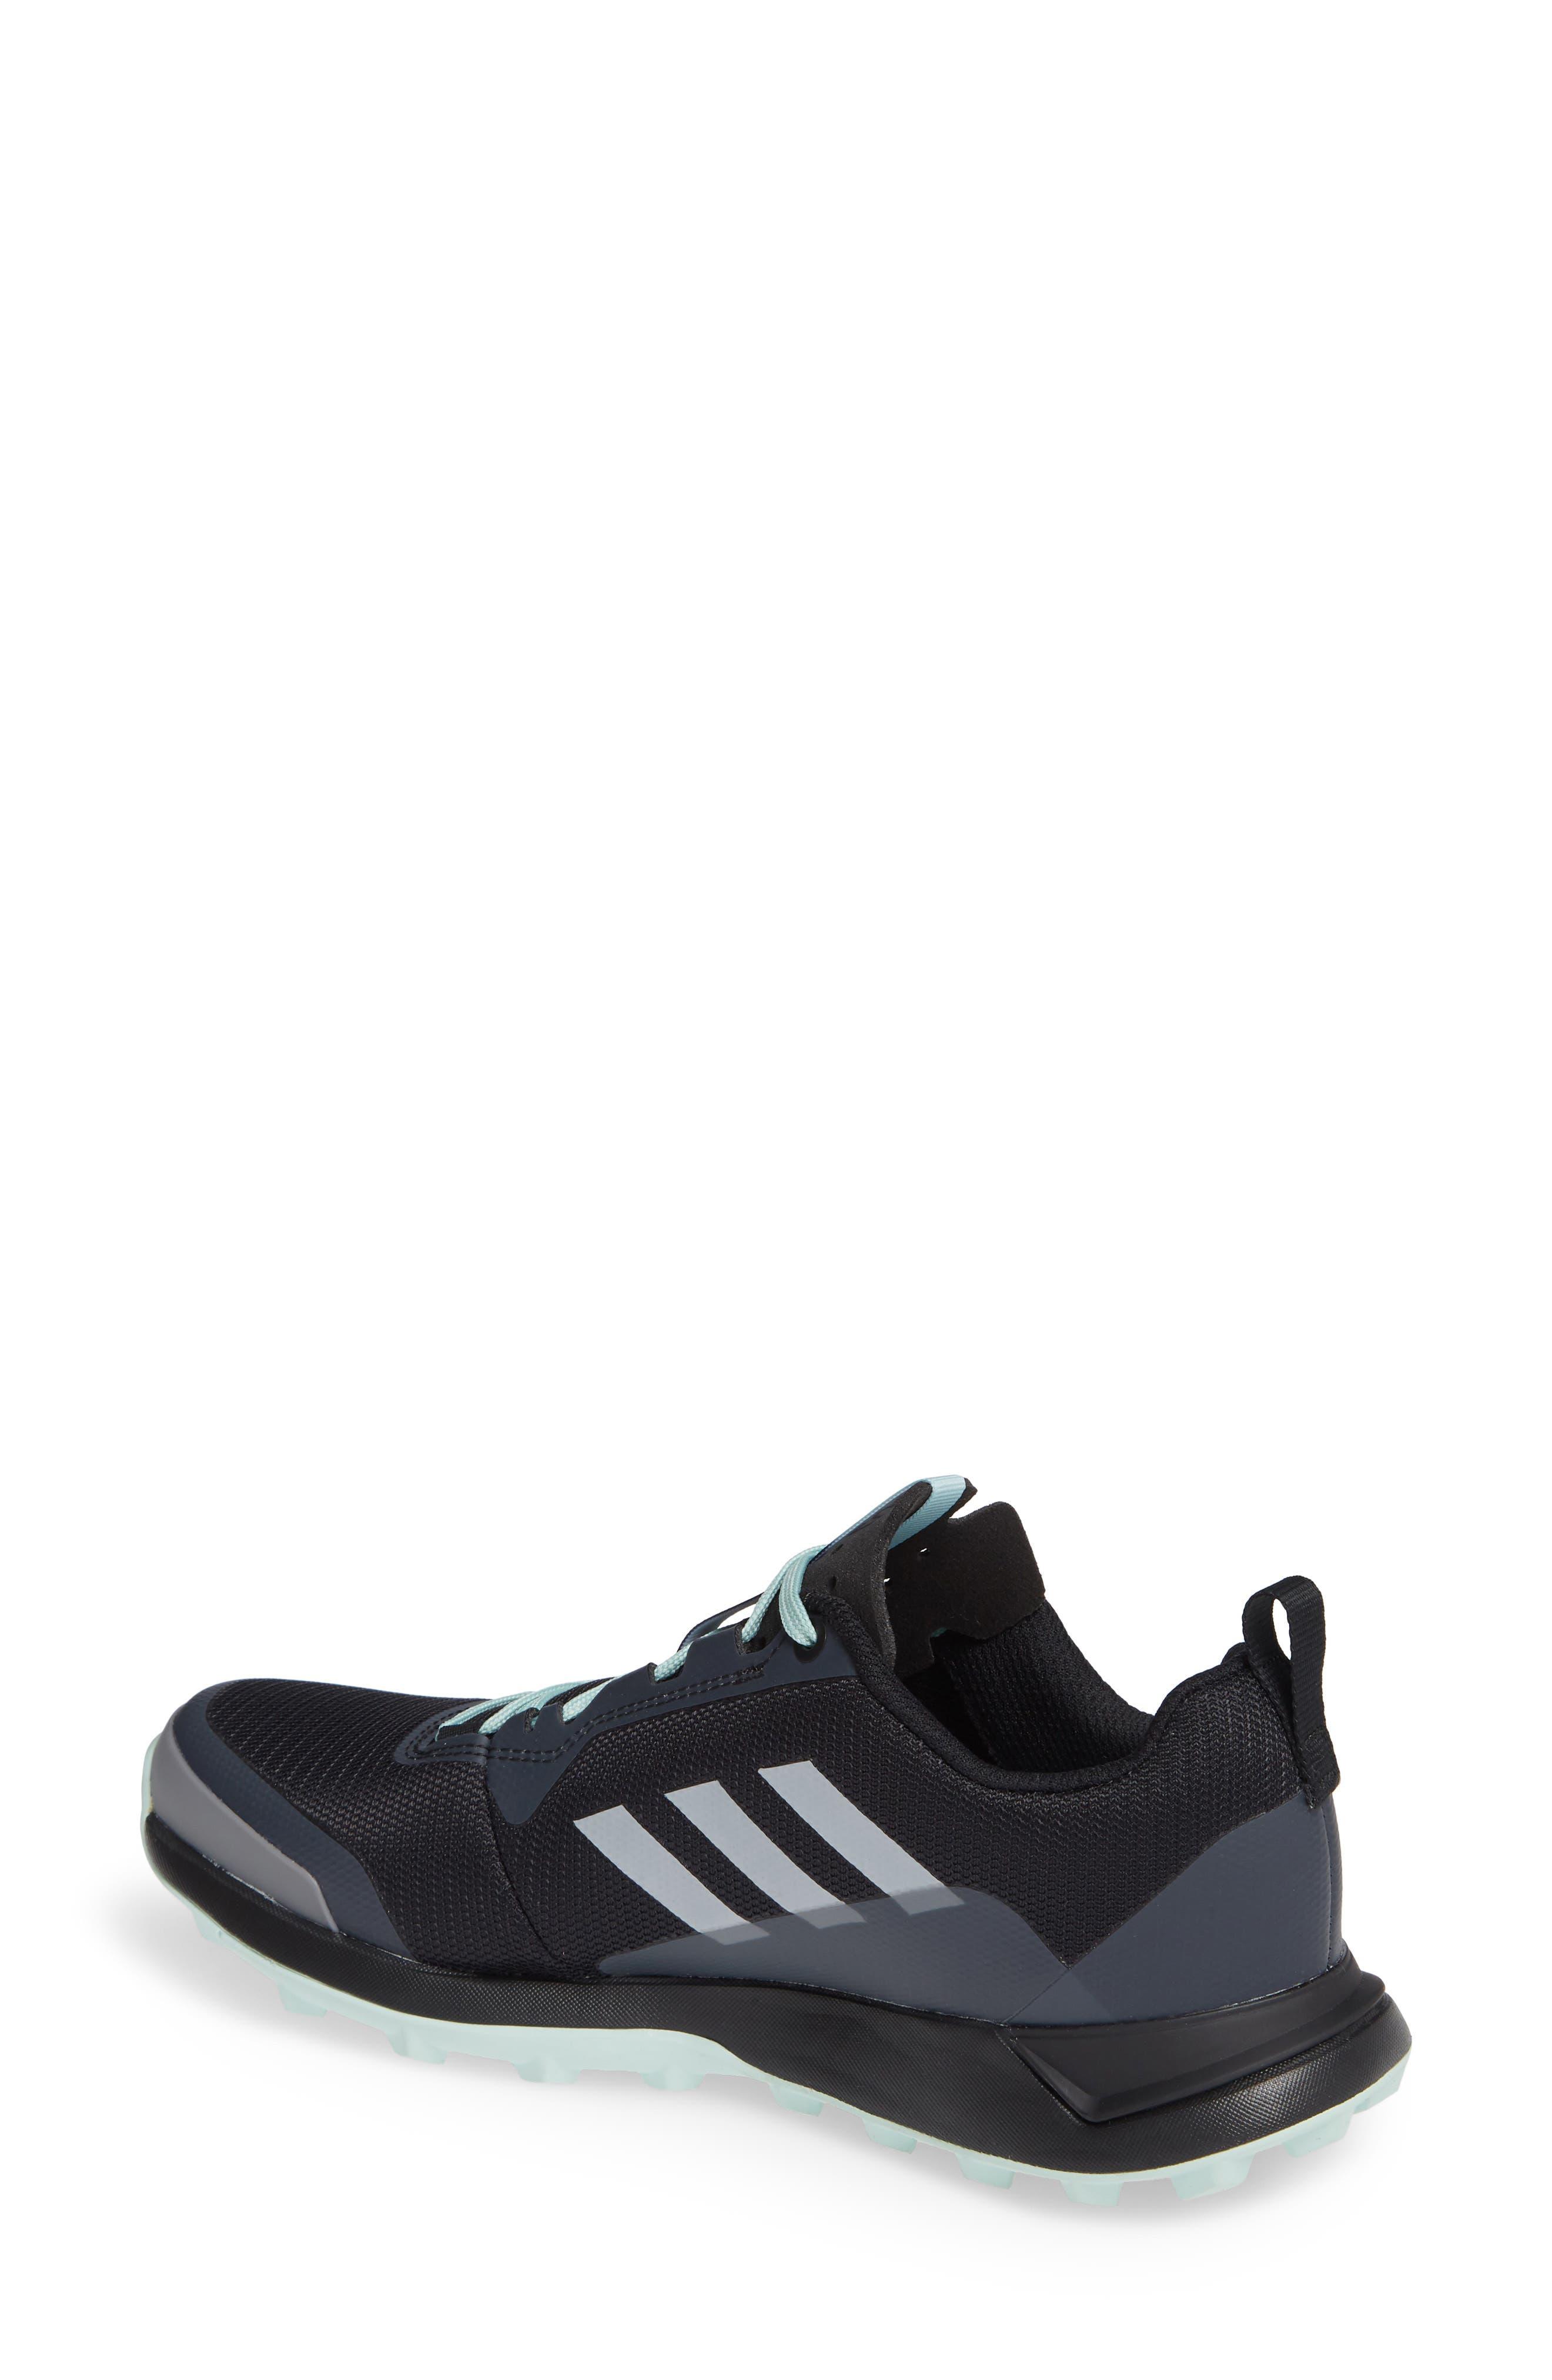 Terrex CMTK Gore-Tex<sup>®</sup> Waterproof Hiking Sneaker,                             Alternate thumbnail 2, color,                             BLACK/ CHALK WHITE/ ASH GREEN